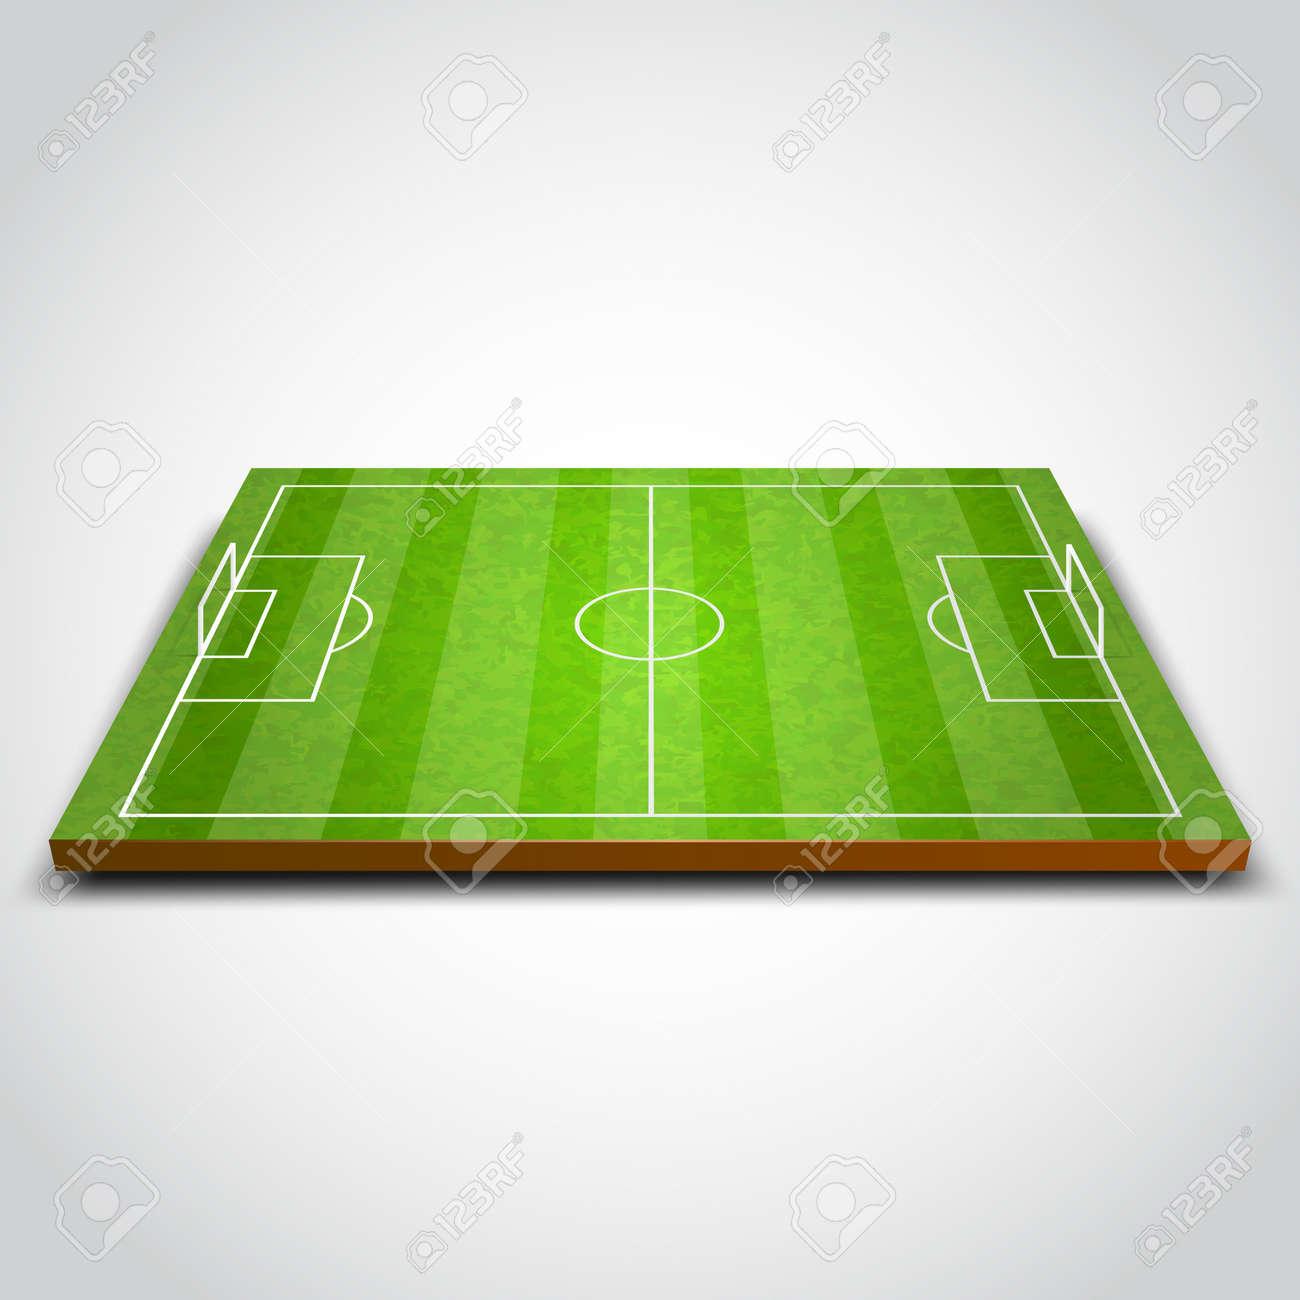 Clear green football or soccer field. Vector illustration - 35949368